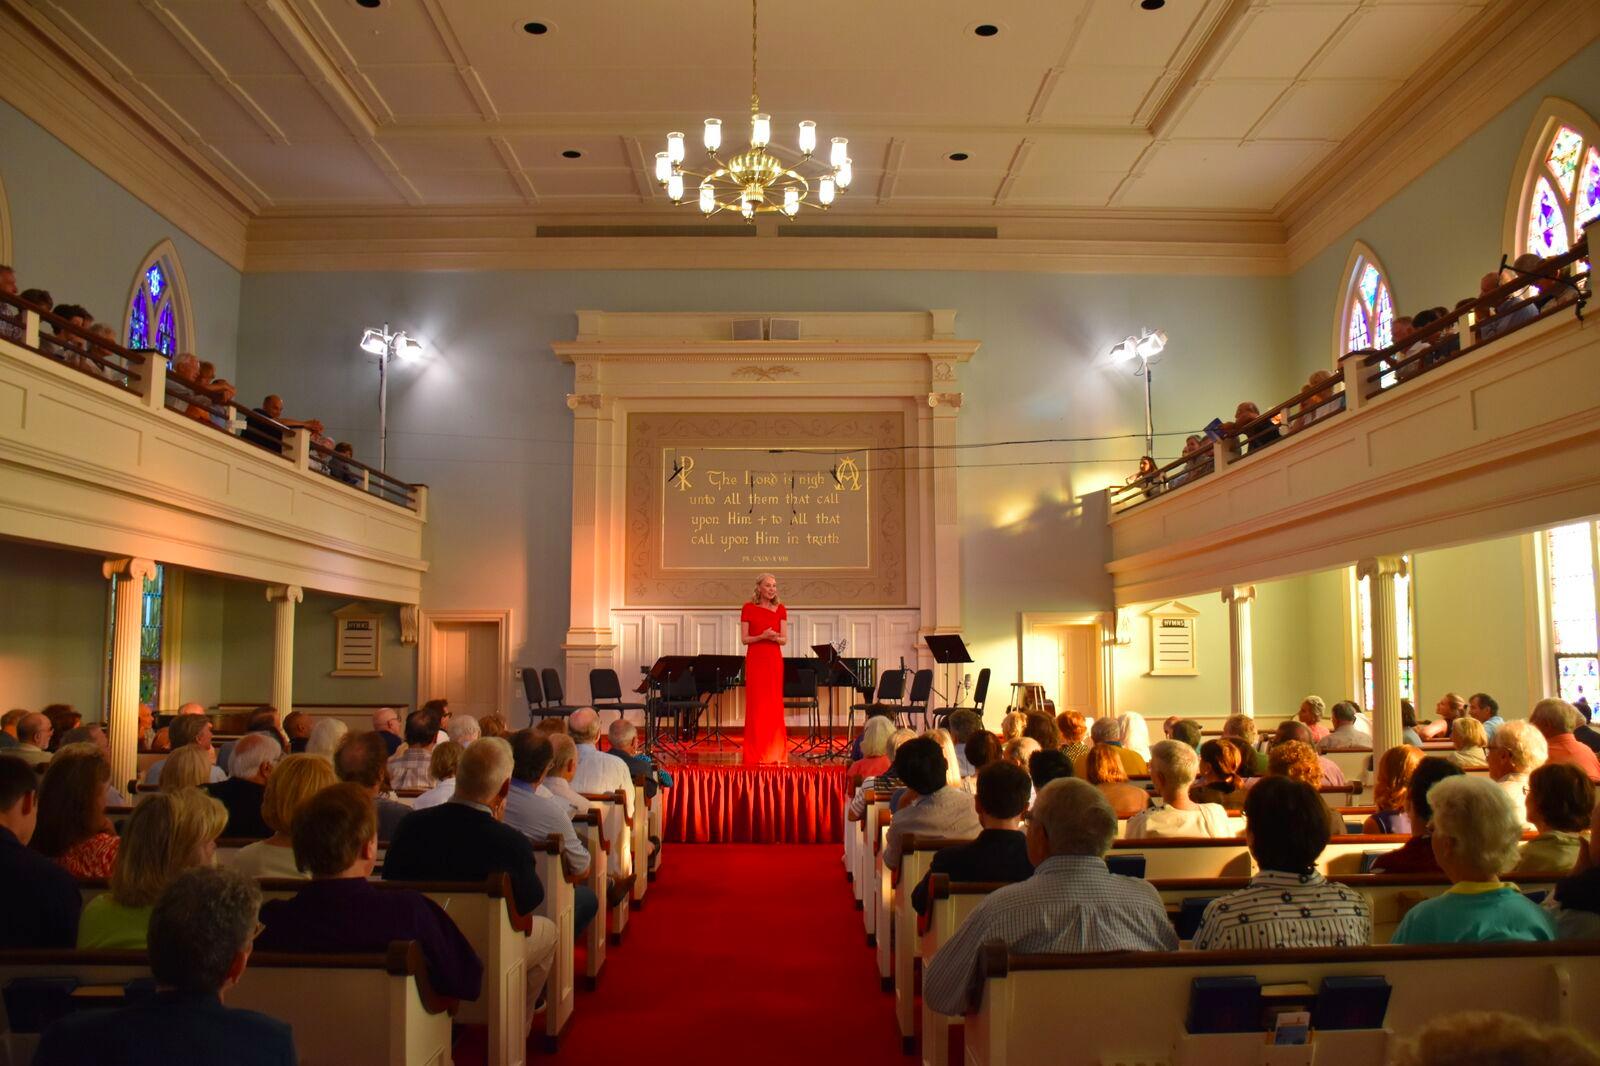 Marya Martin, founder of the Bridgehampton Chamber Music Festival, durng a previous festival at the Bridgehampton Presbyterian Church.